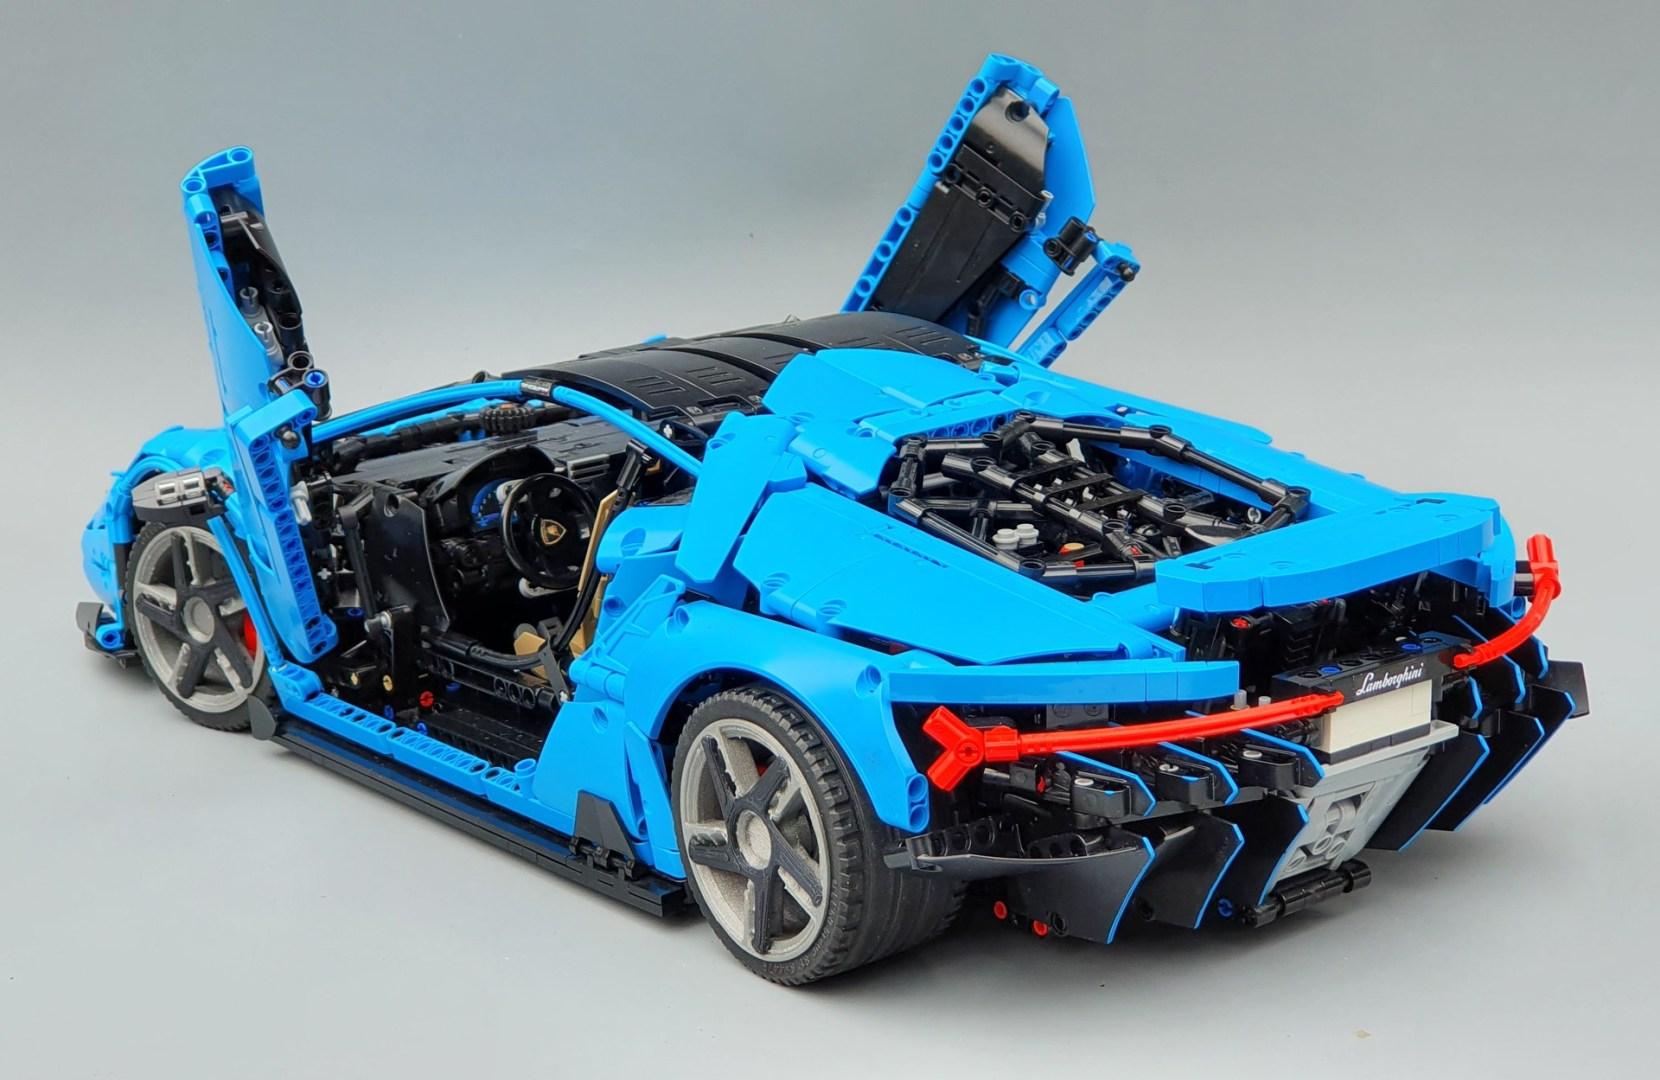 Quelle: Rebrickable - T-Lego Lamborghini Centenario mit offenen Türen